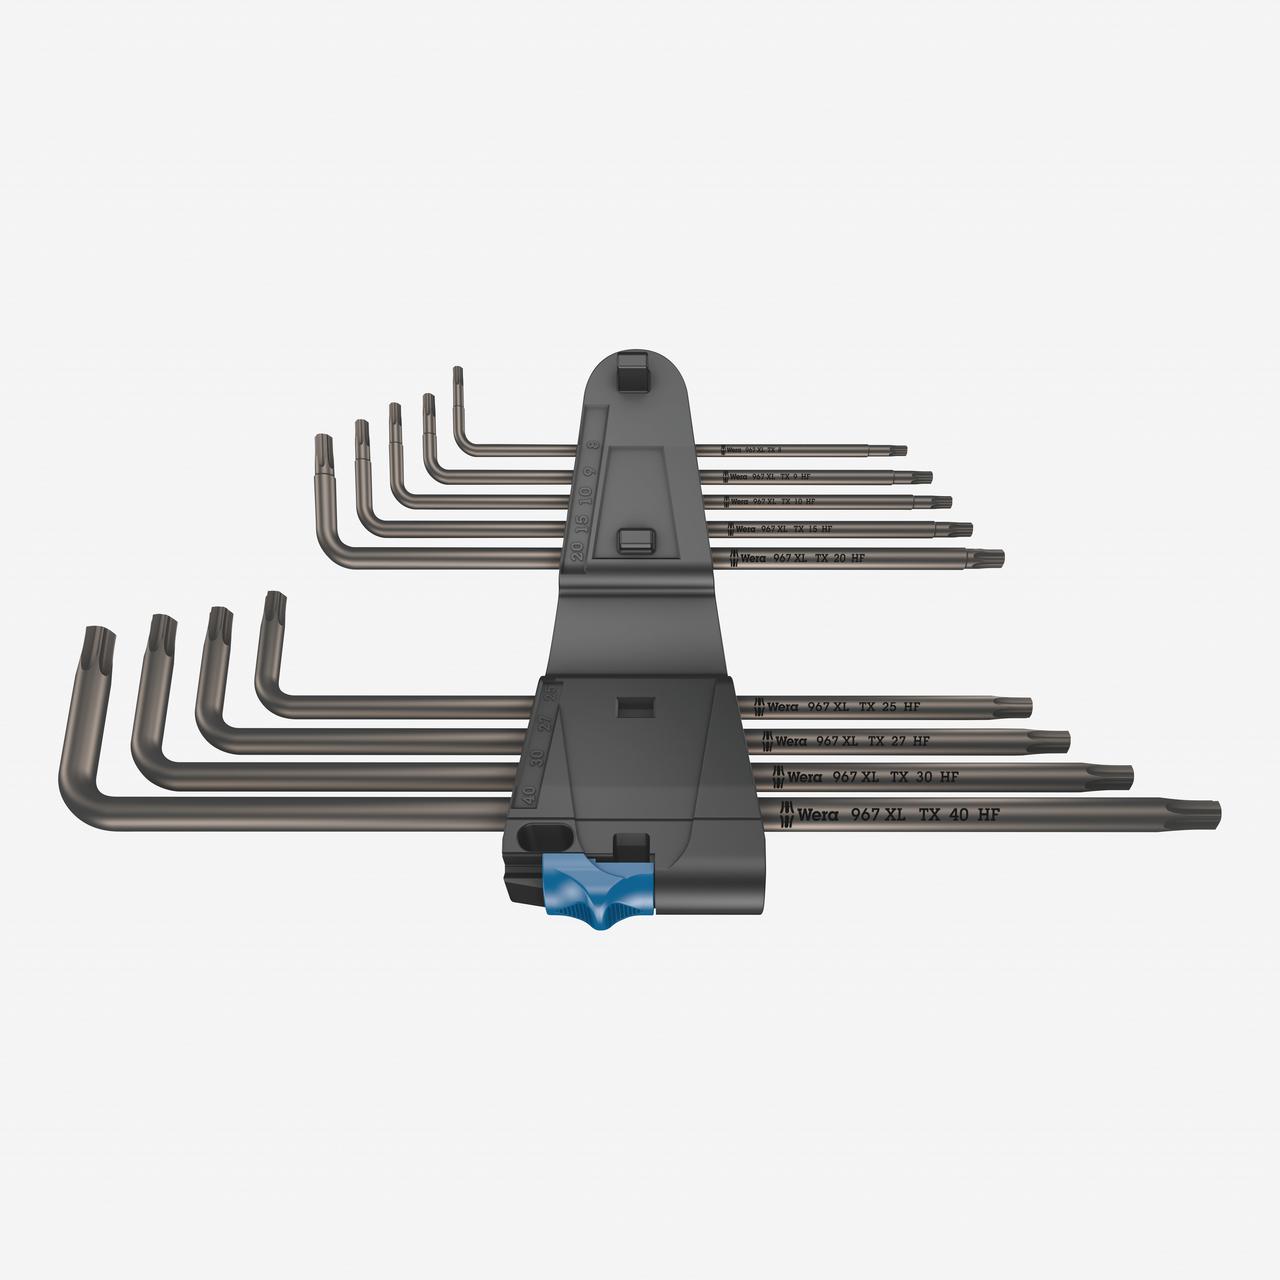 Wera 024450 967/9 TX XL 1 L-key Set with Holding Function, Long - KC Tool